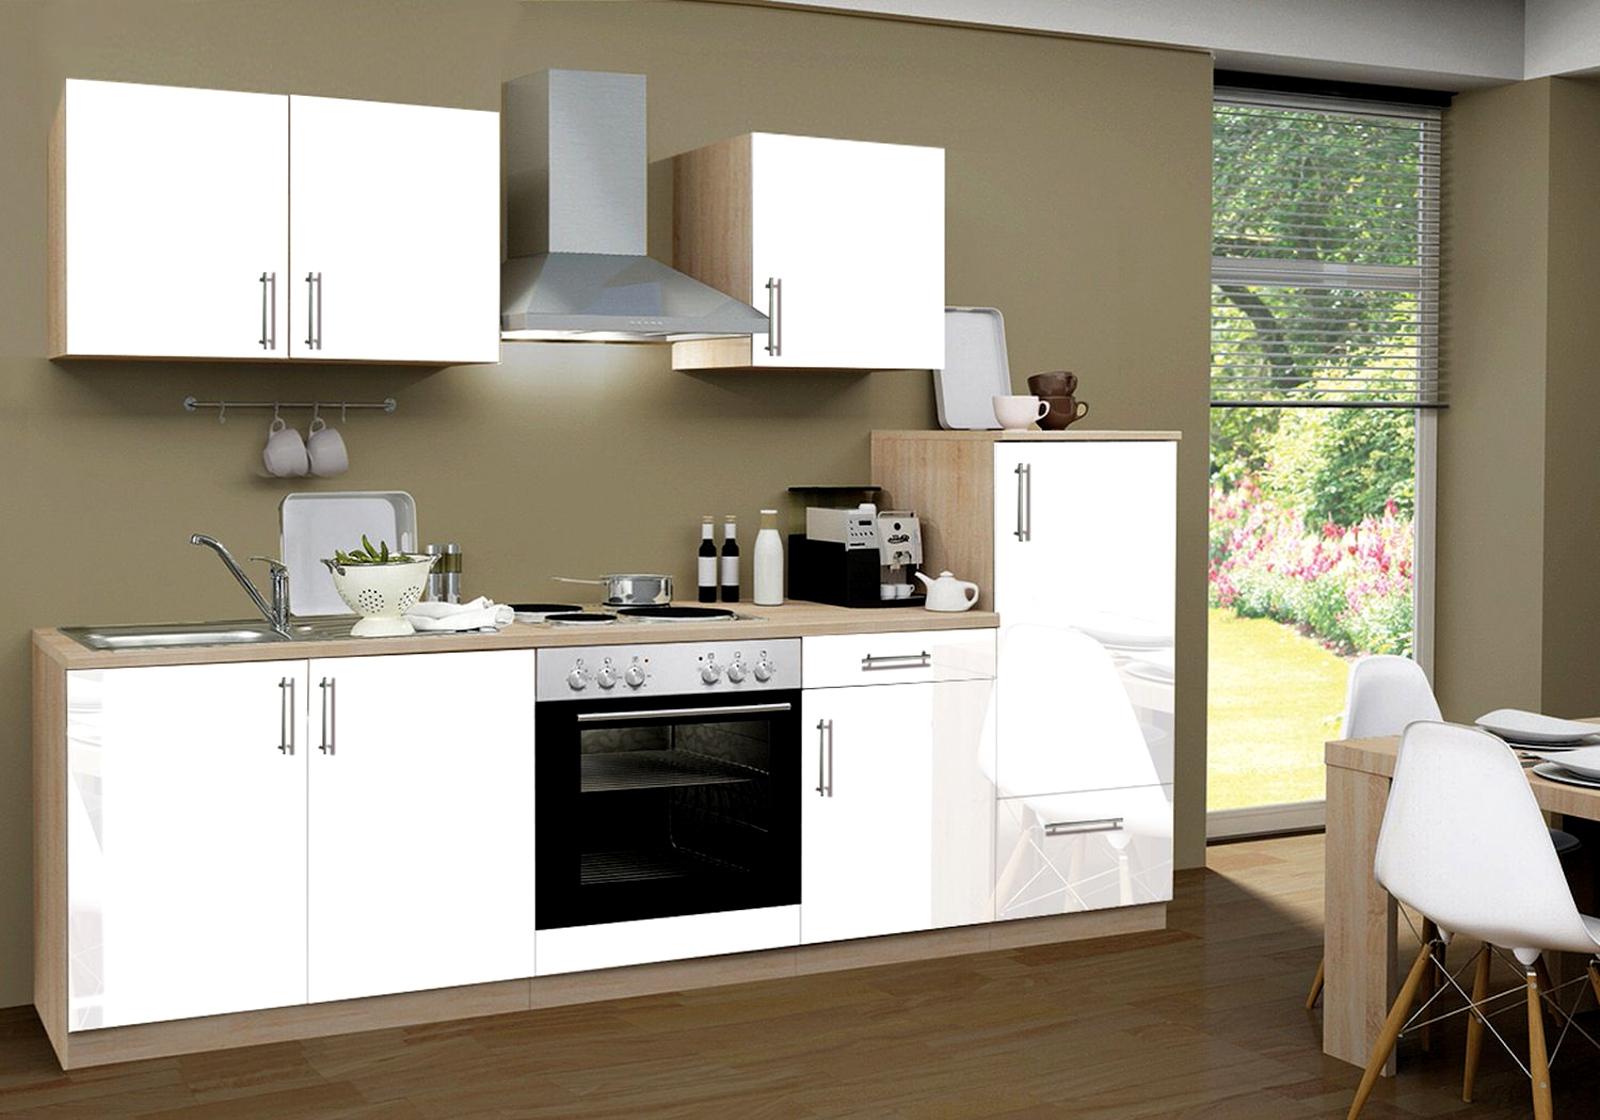 270 breit cool elegantes cm breit in bezug auf diy selbst. Black Bedroom Furniture Sets. Home Design Ideas